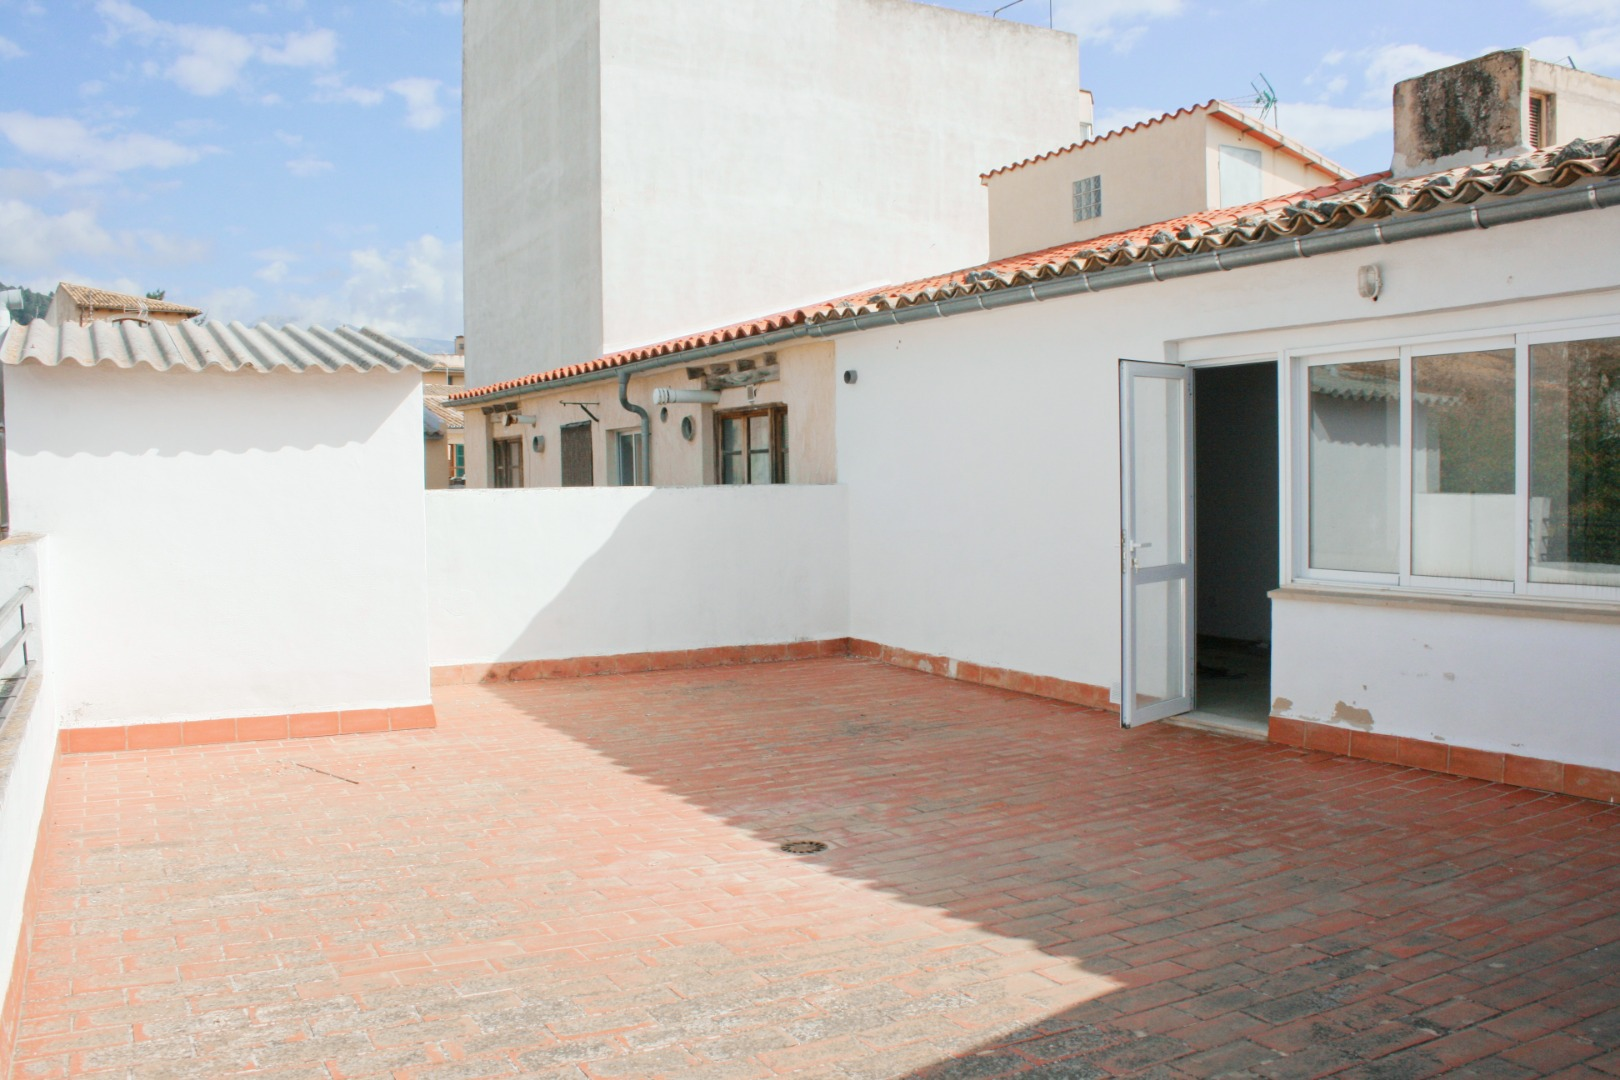 Edifici  Calle josep ferragut. Edificio Lloseta